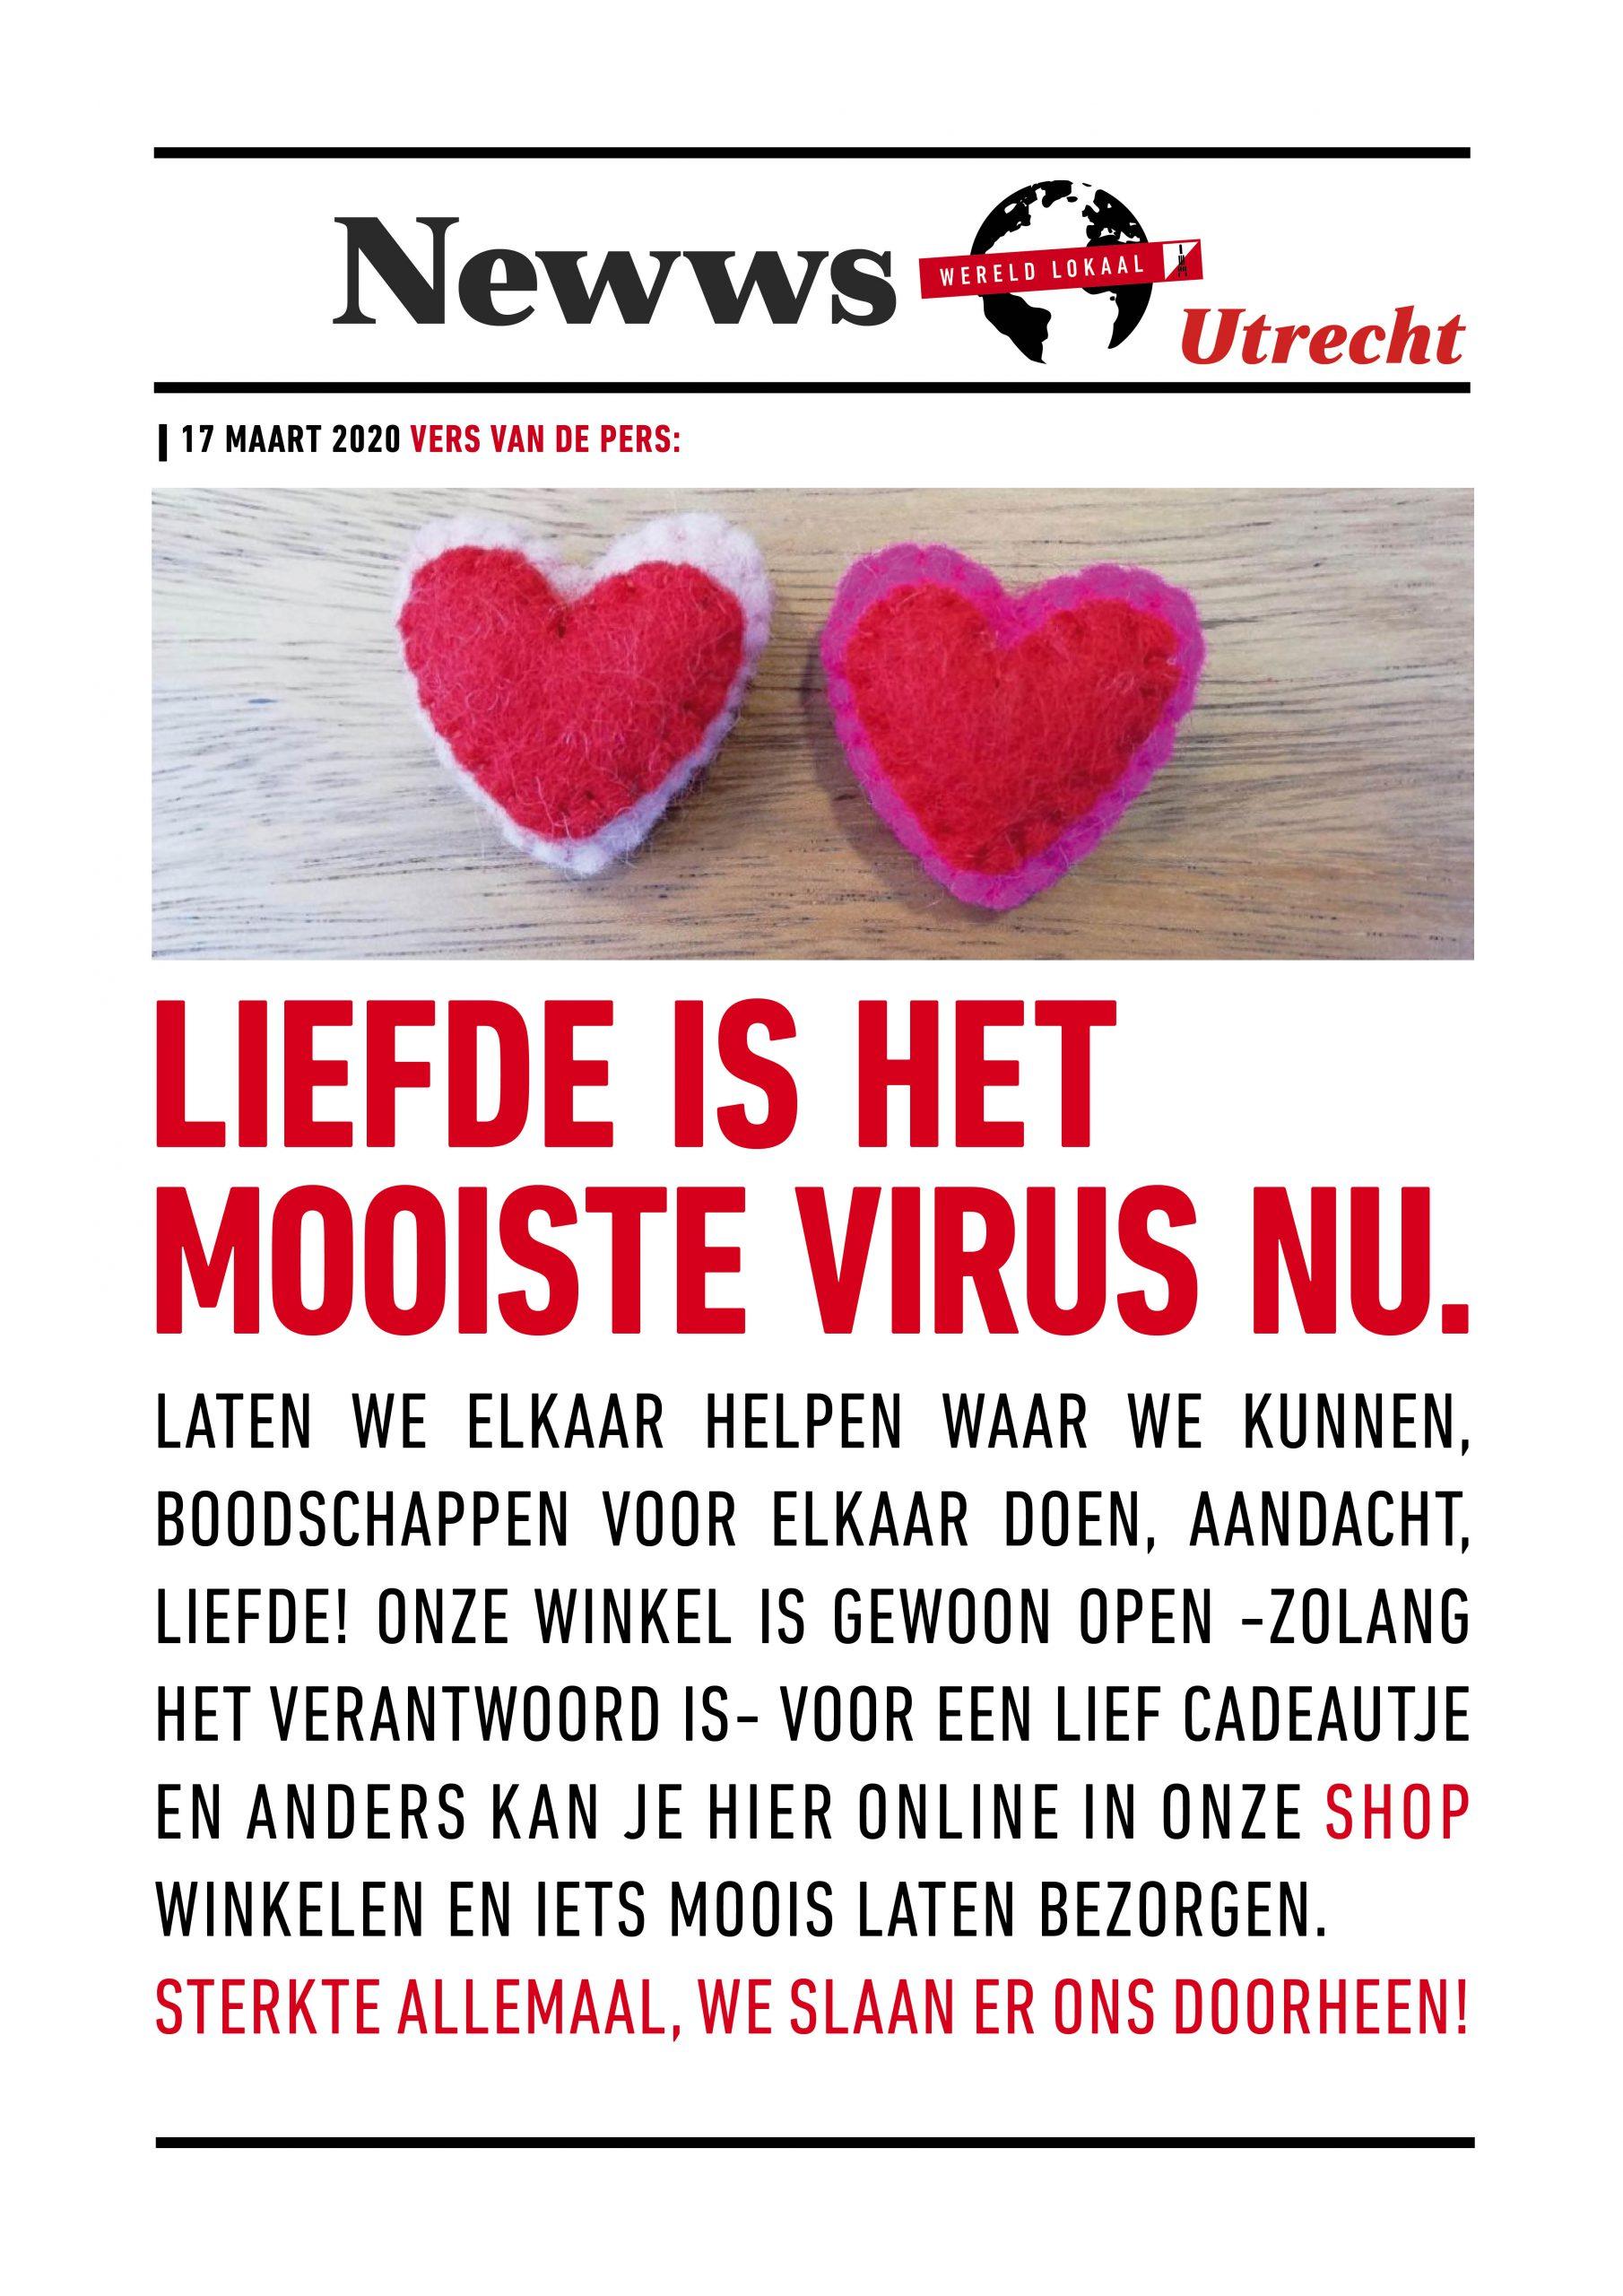 Newws virus